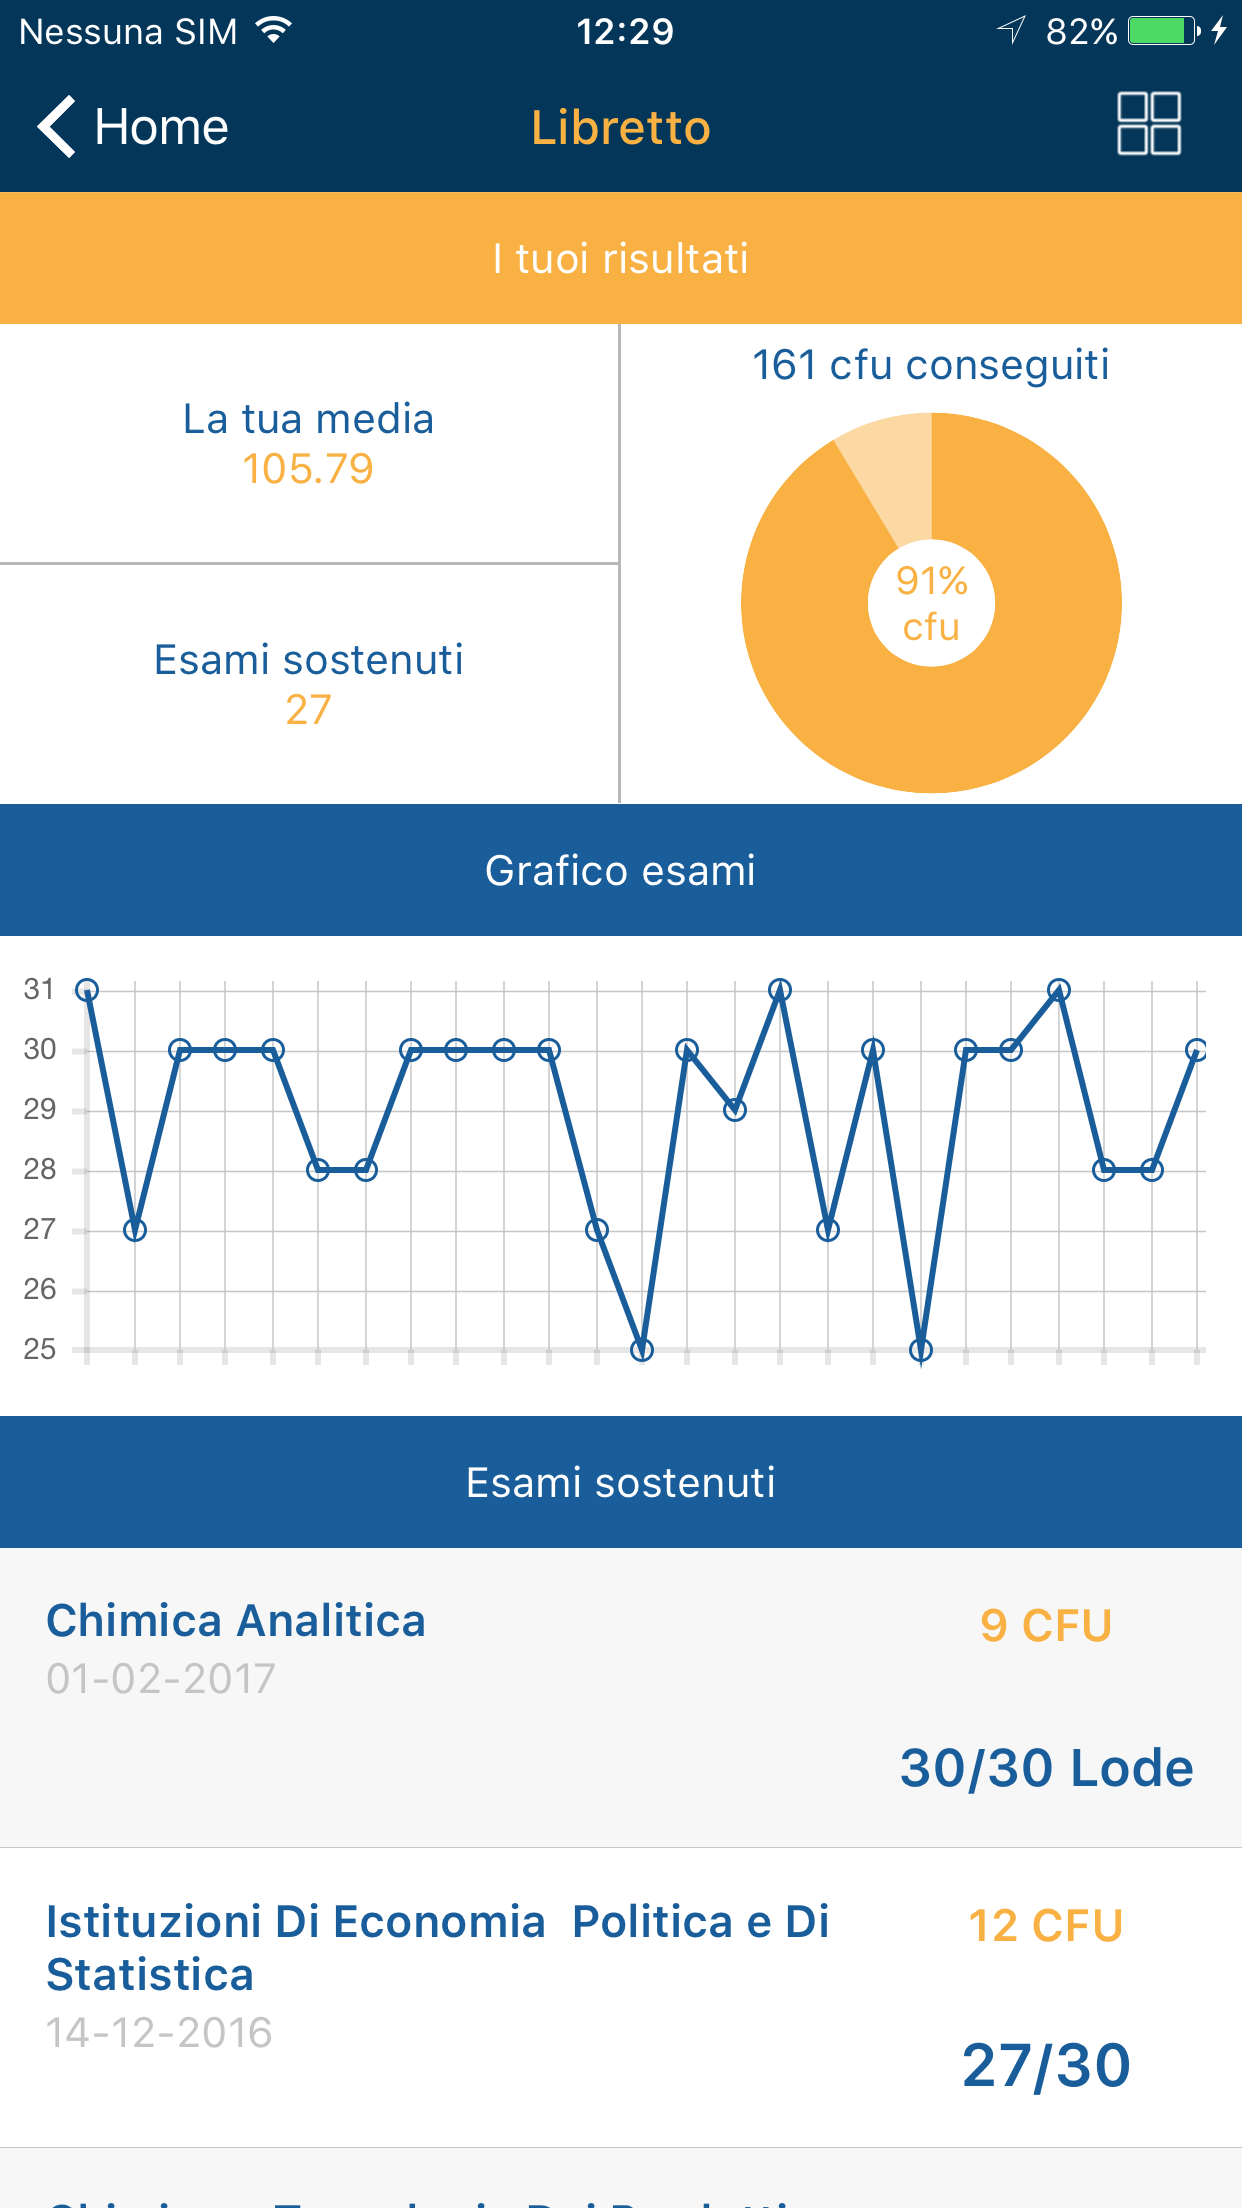 Unicatt Calendario Esami.Icatt Mobile E Arrivata La Nuova App Universita Cattolica